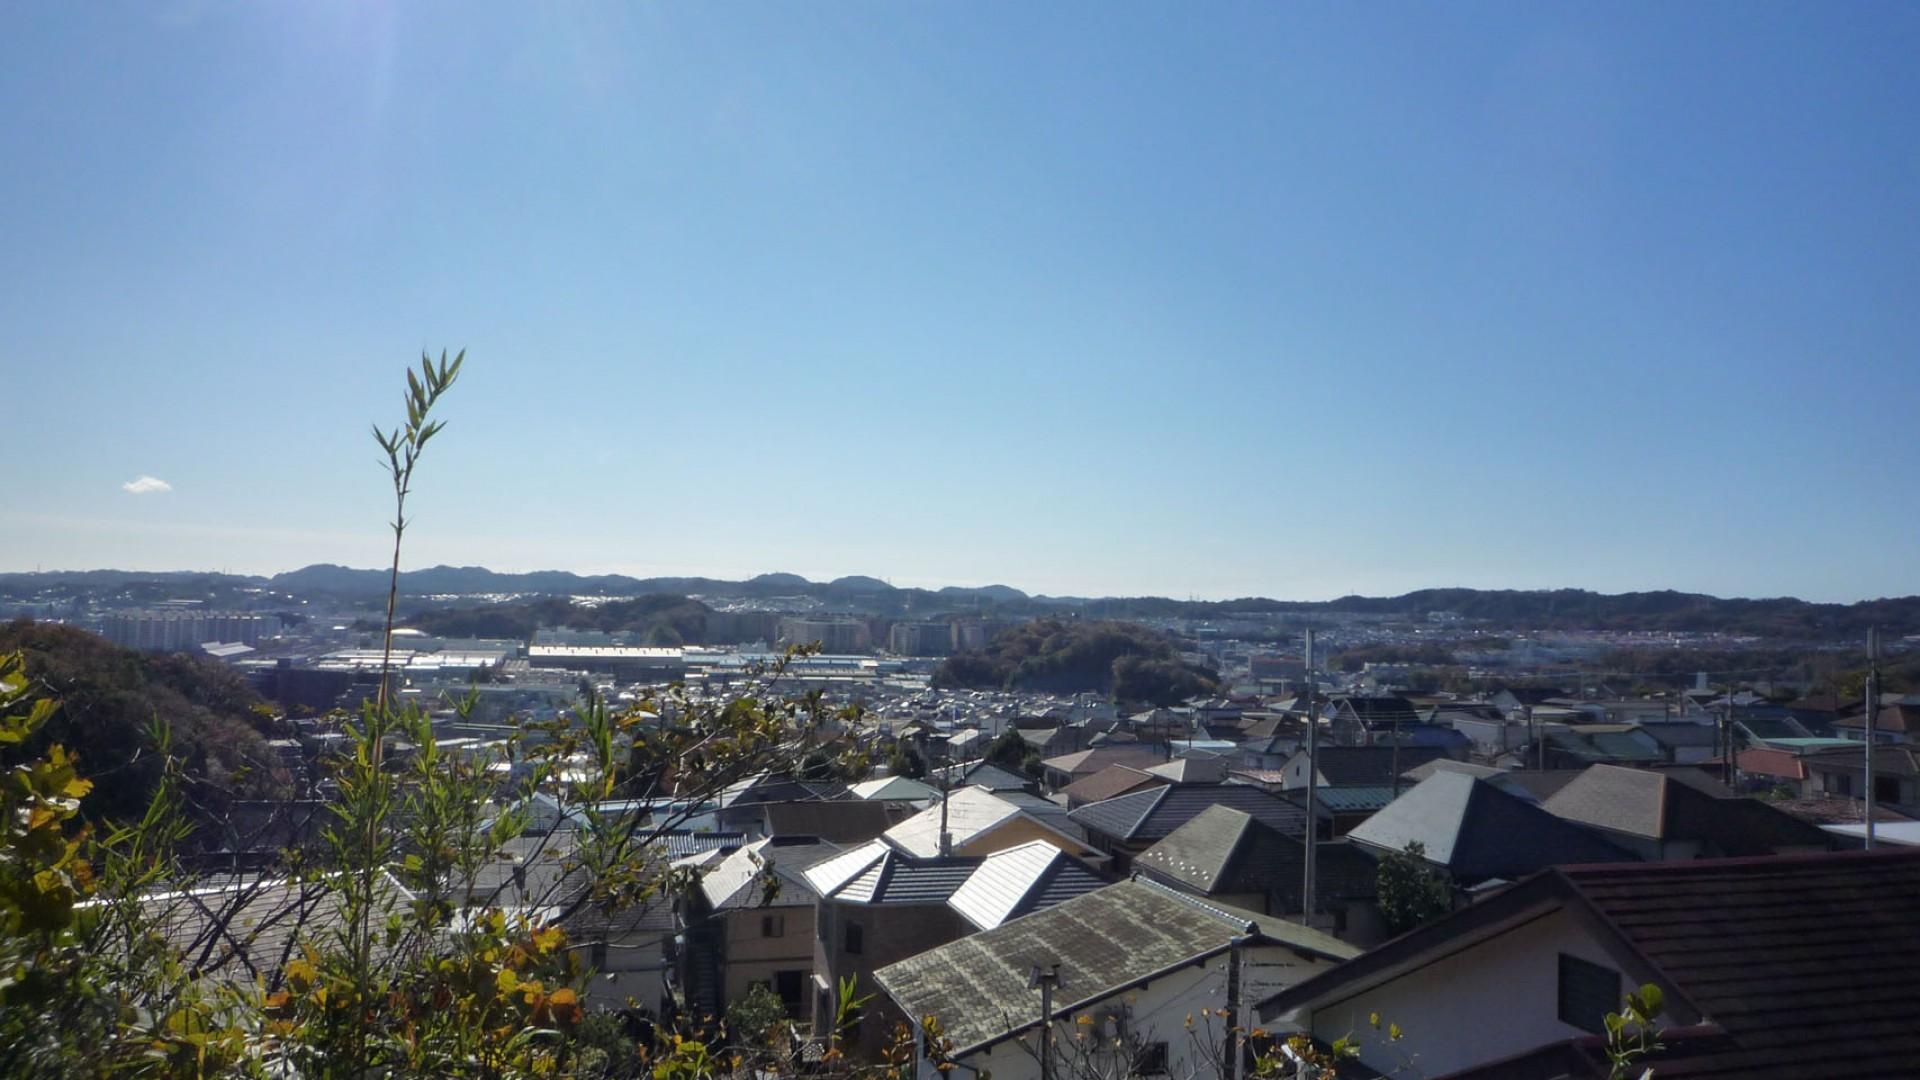 Route Kanazawa (chemins de randonnée de Kanazawa)